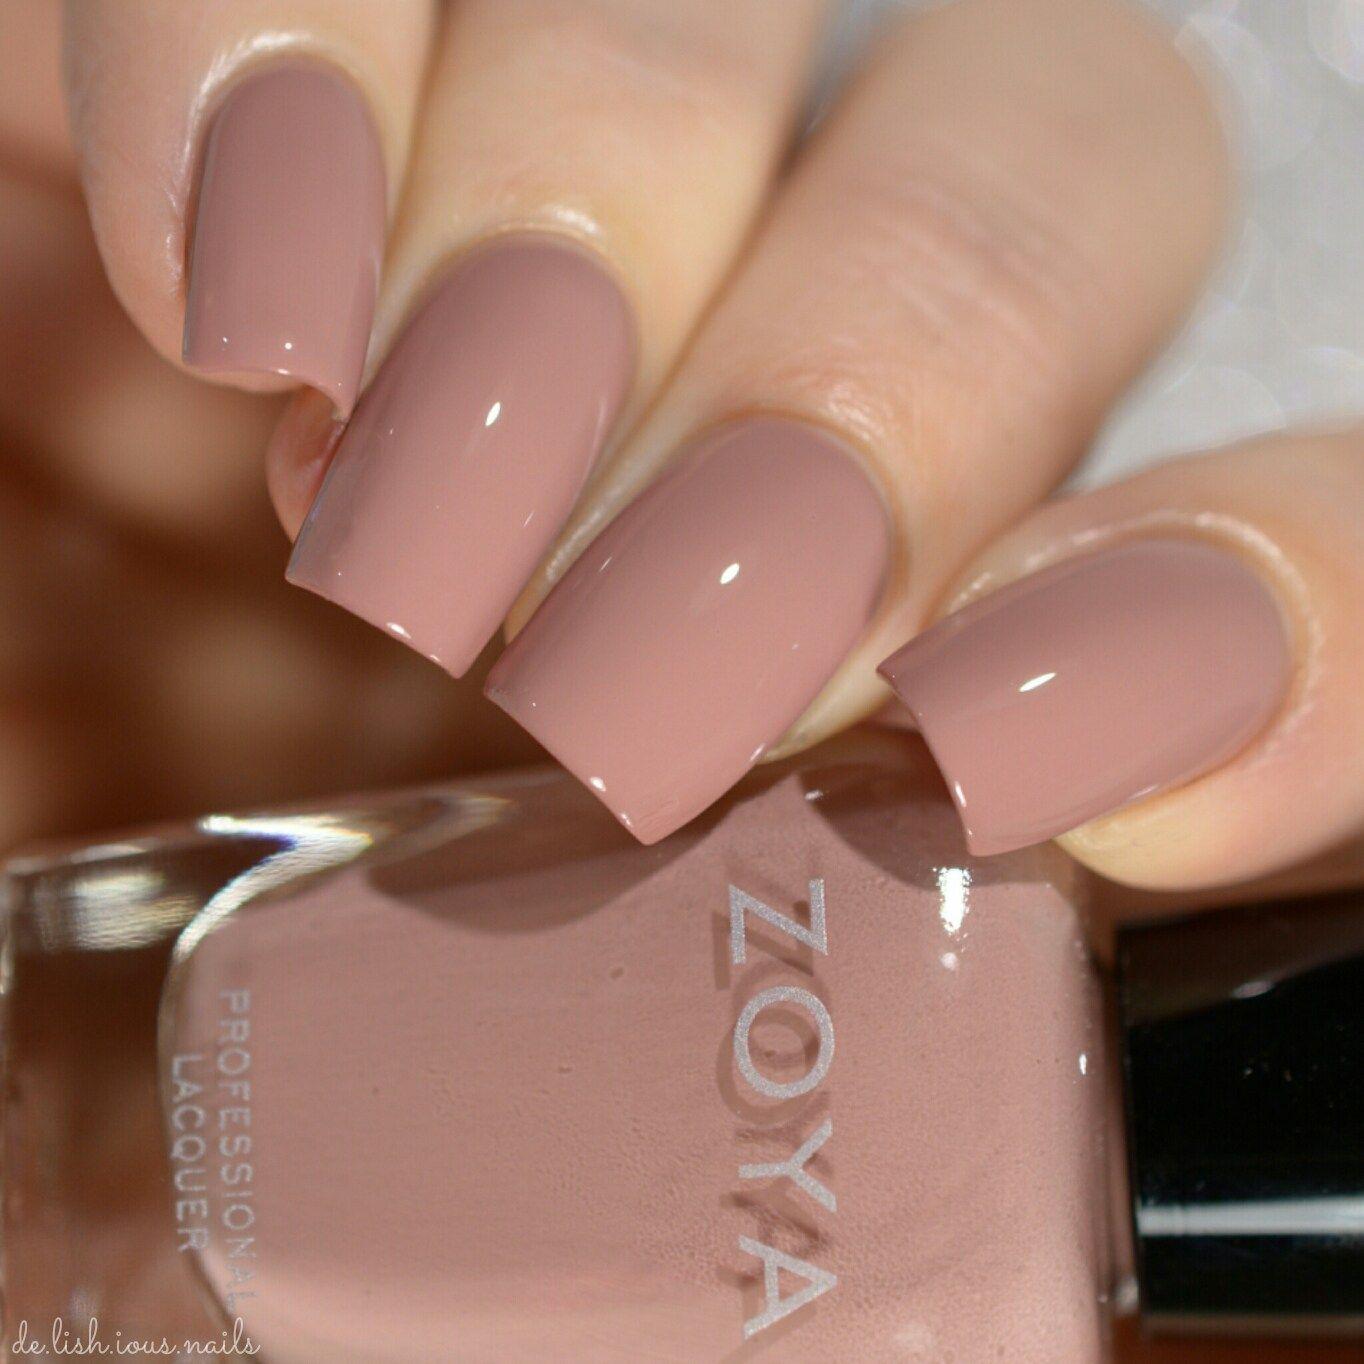 Zoya Naturel 3 - Delishious Nails